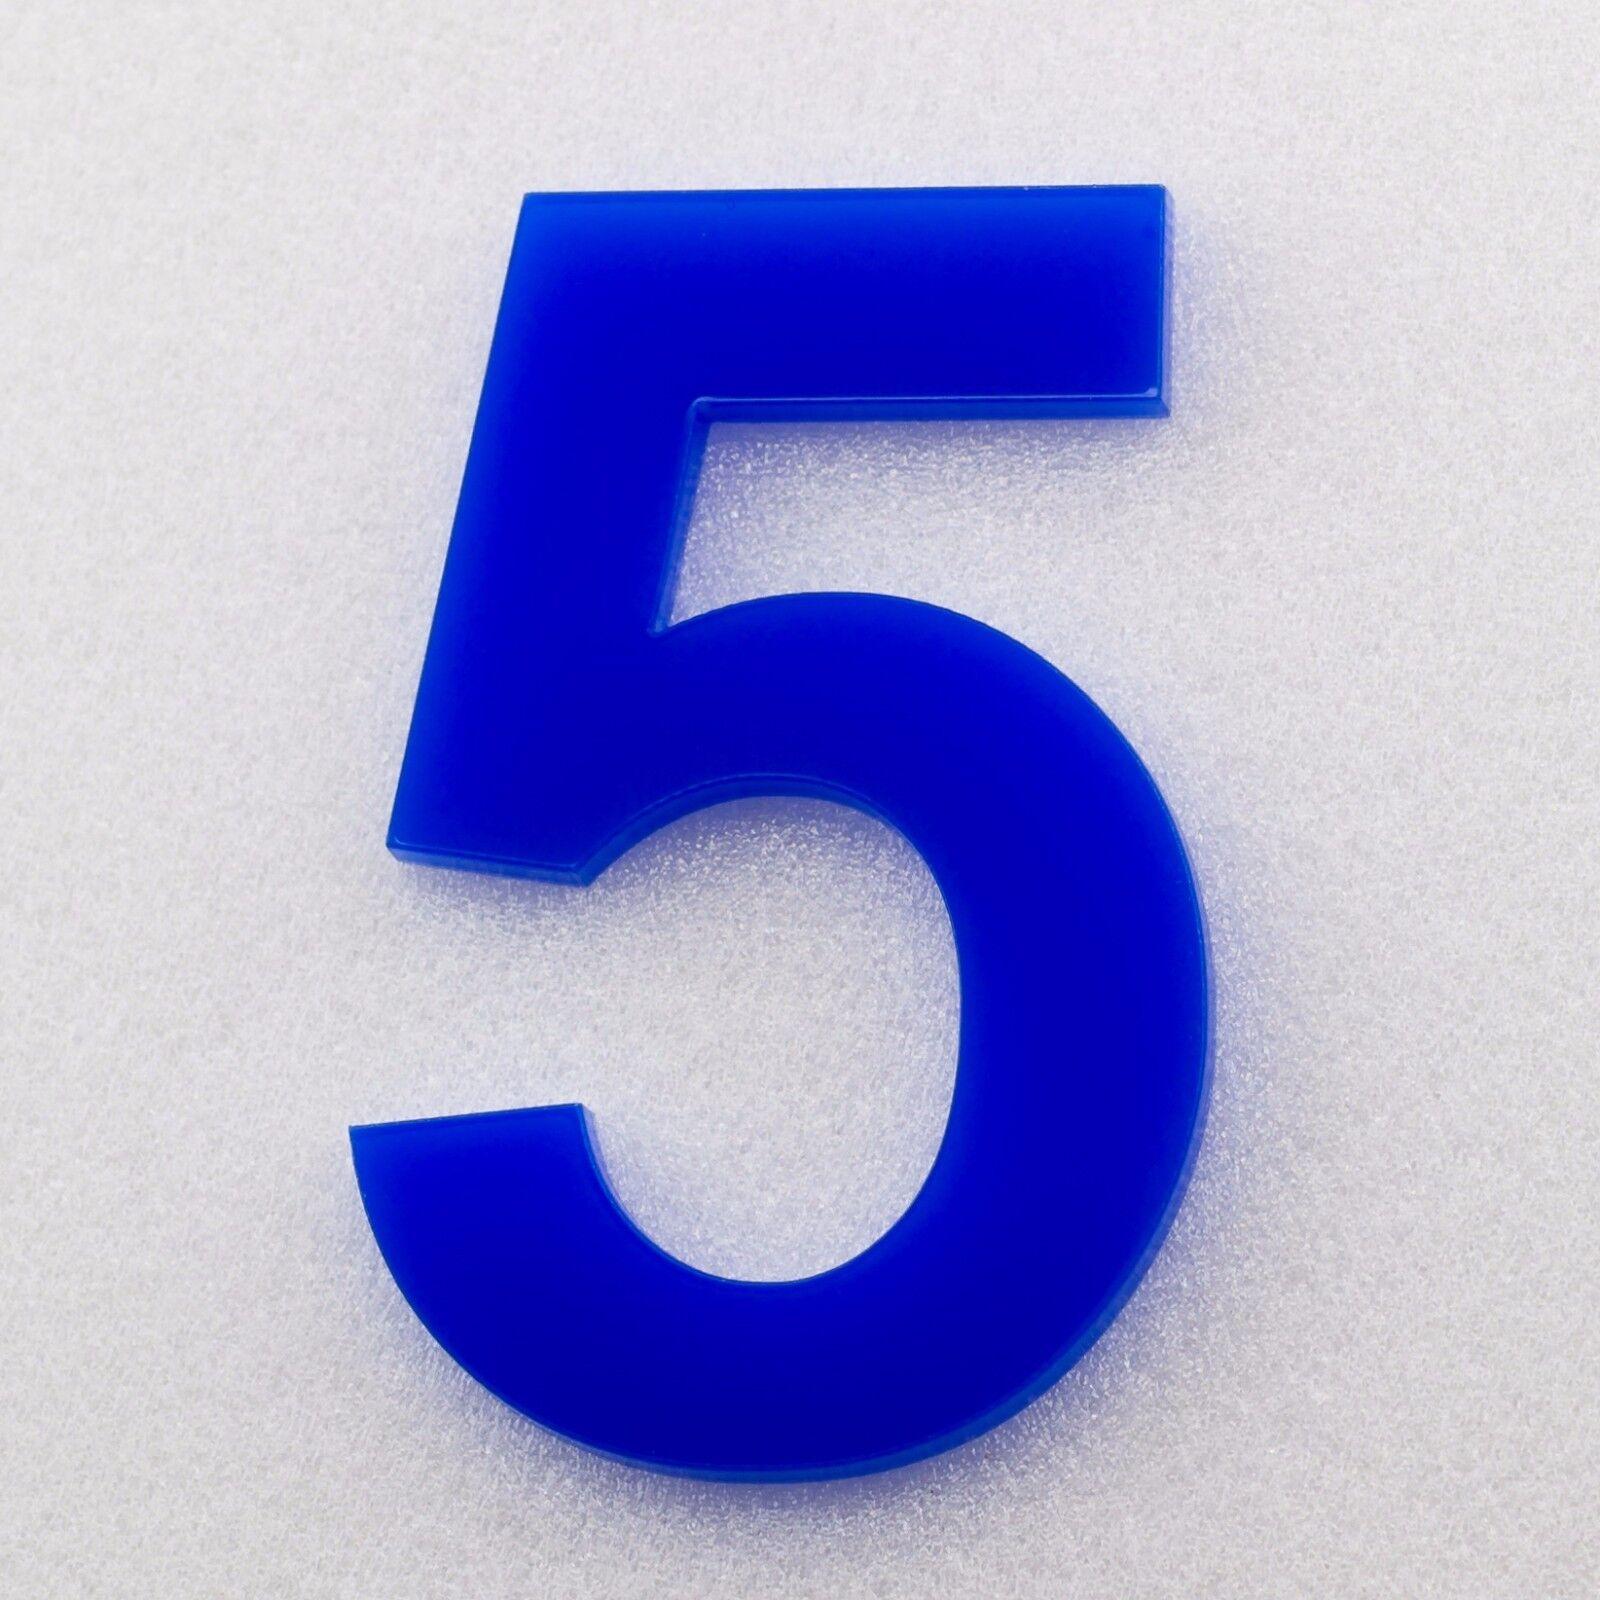 Hausnummer Acryl Hochglanz Blau 5H01 - Türnummer - Nummer - Plexiglas